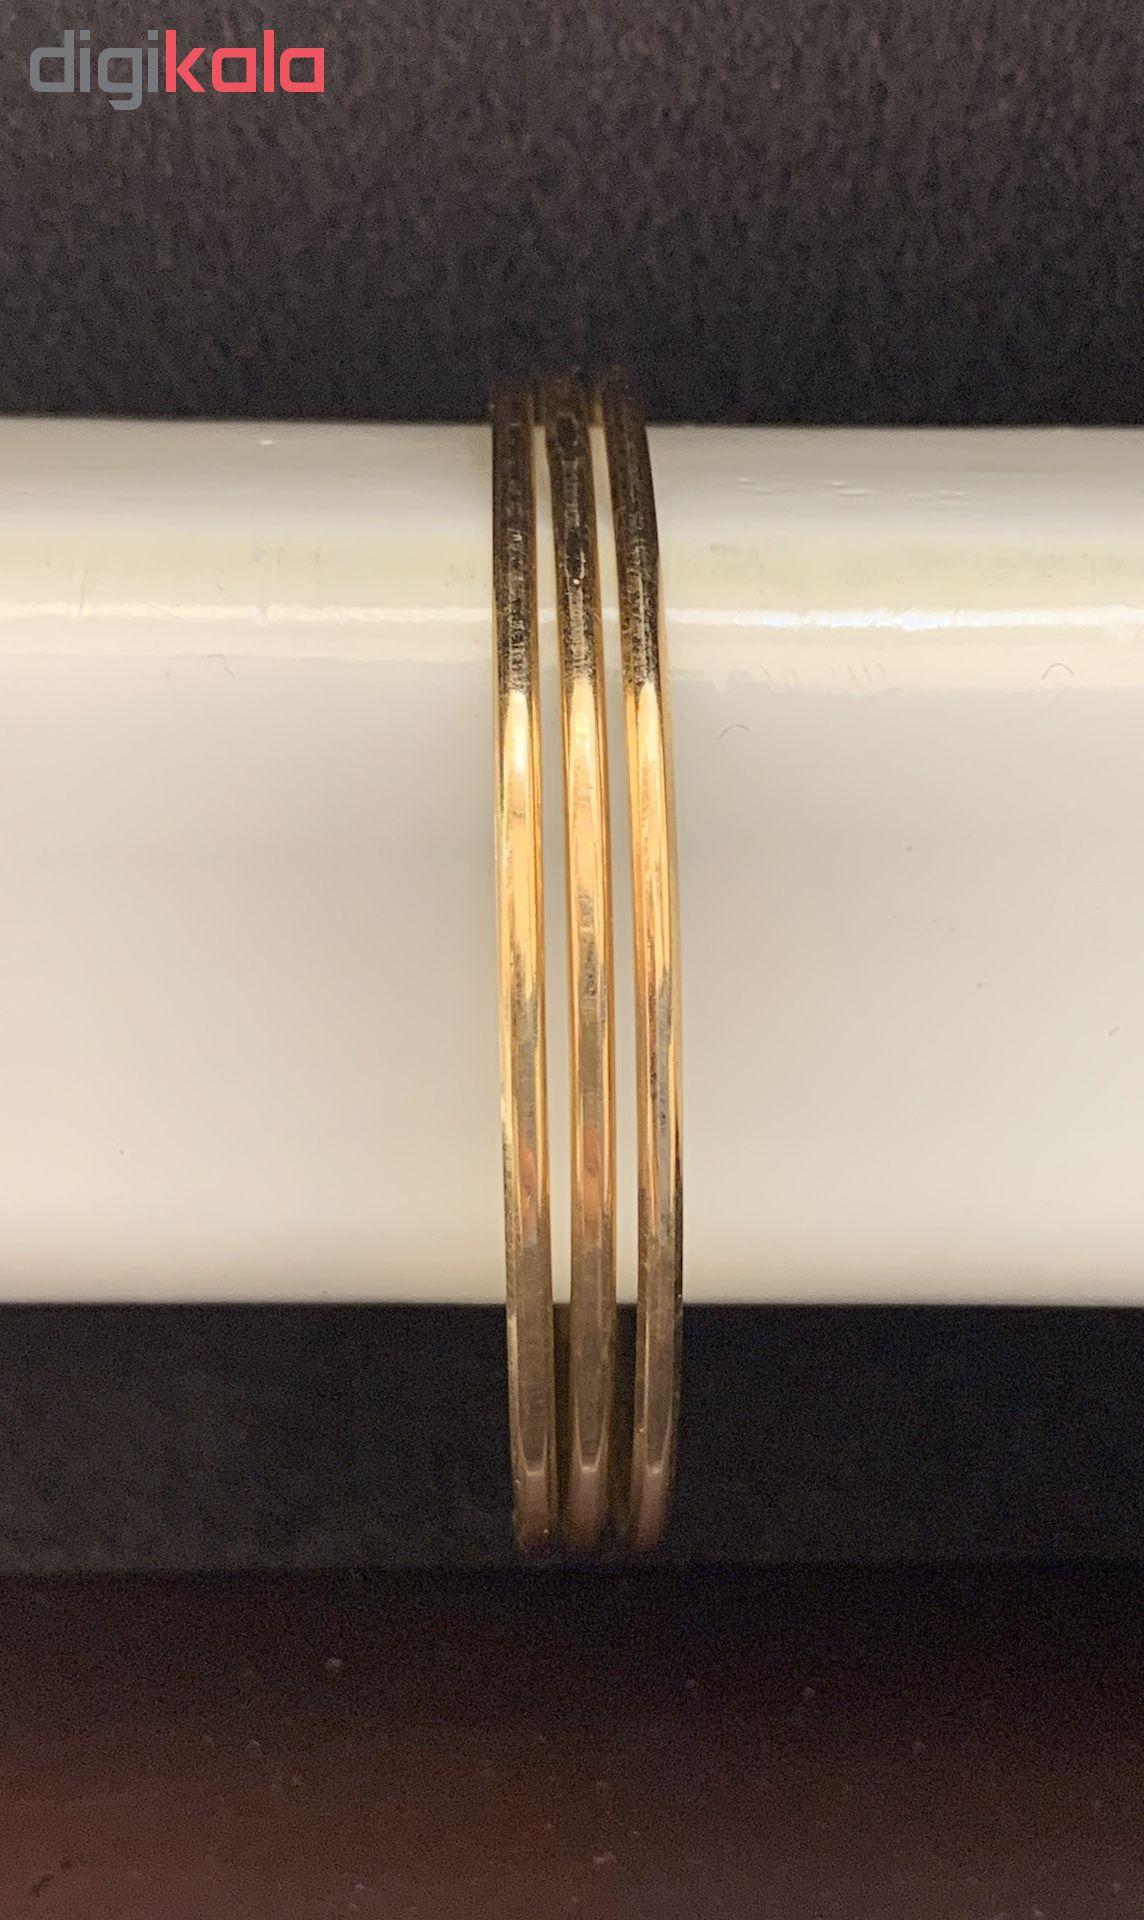 النگو طلا 18 عیار گوی گالری مدل G262